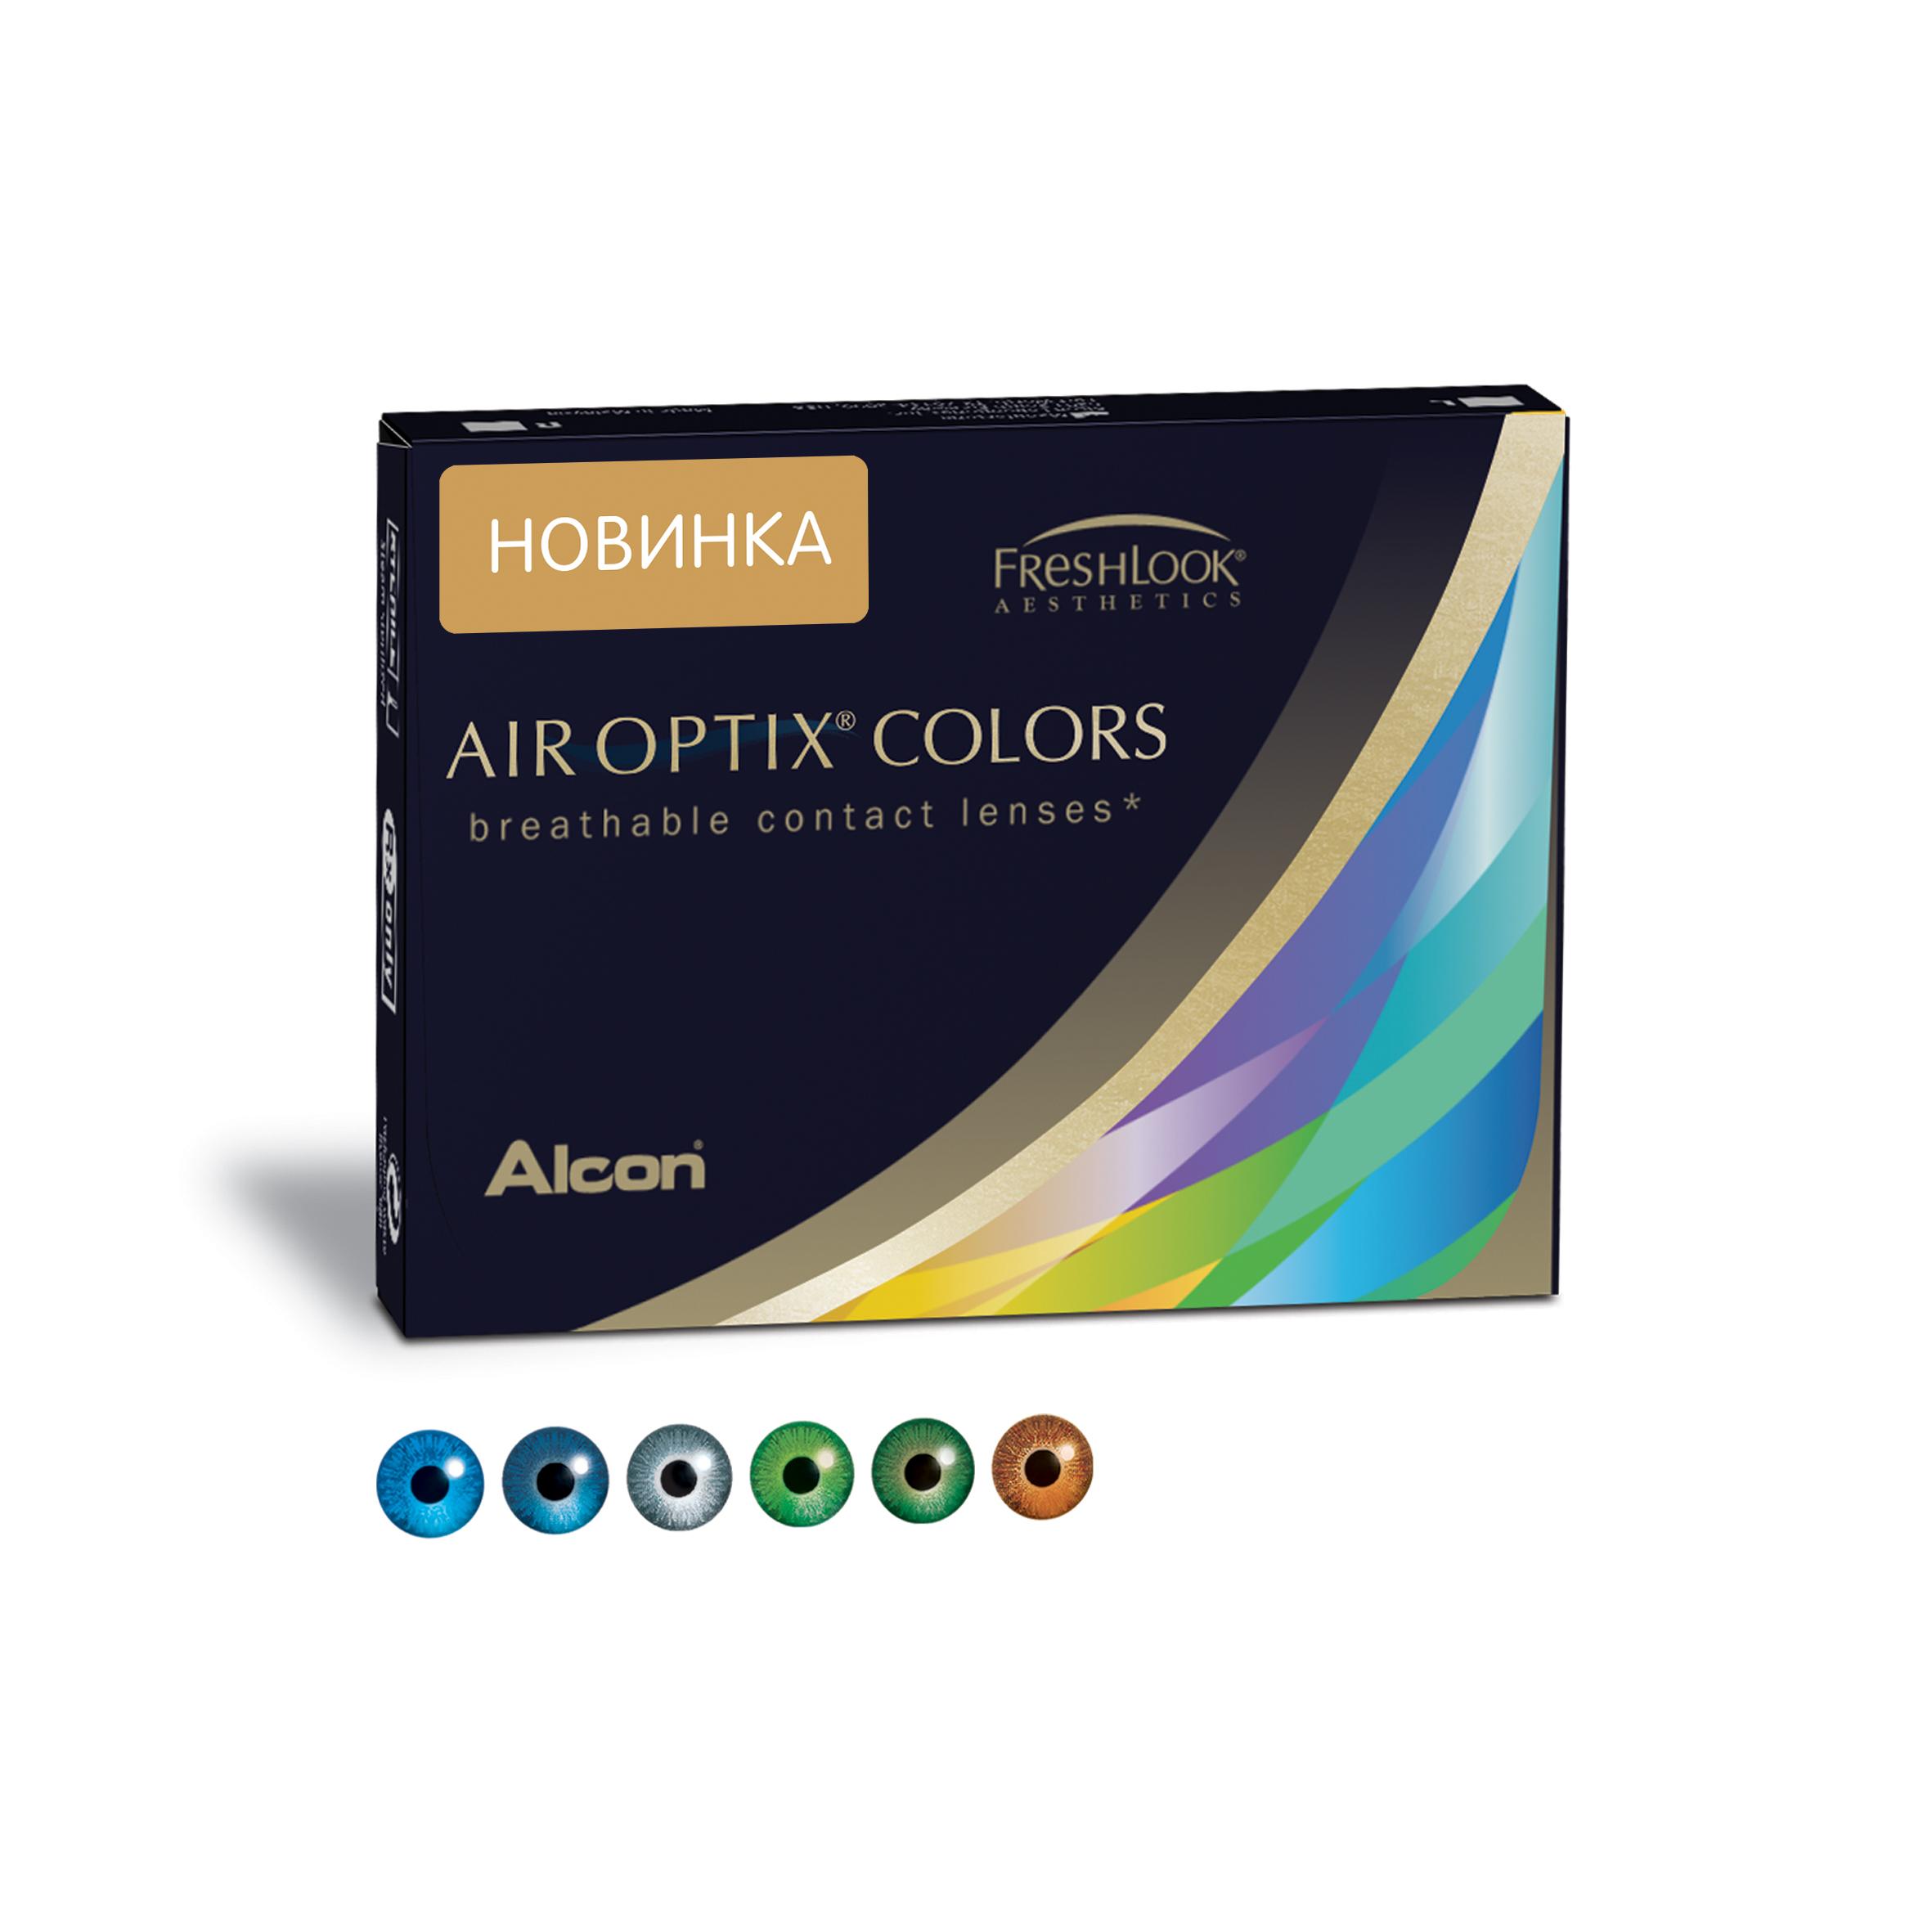 Аlcon контактные линзы Air Optix Colors 2 шт -5.75 Green31746297Мягкие контактные линзы